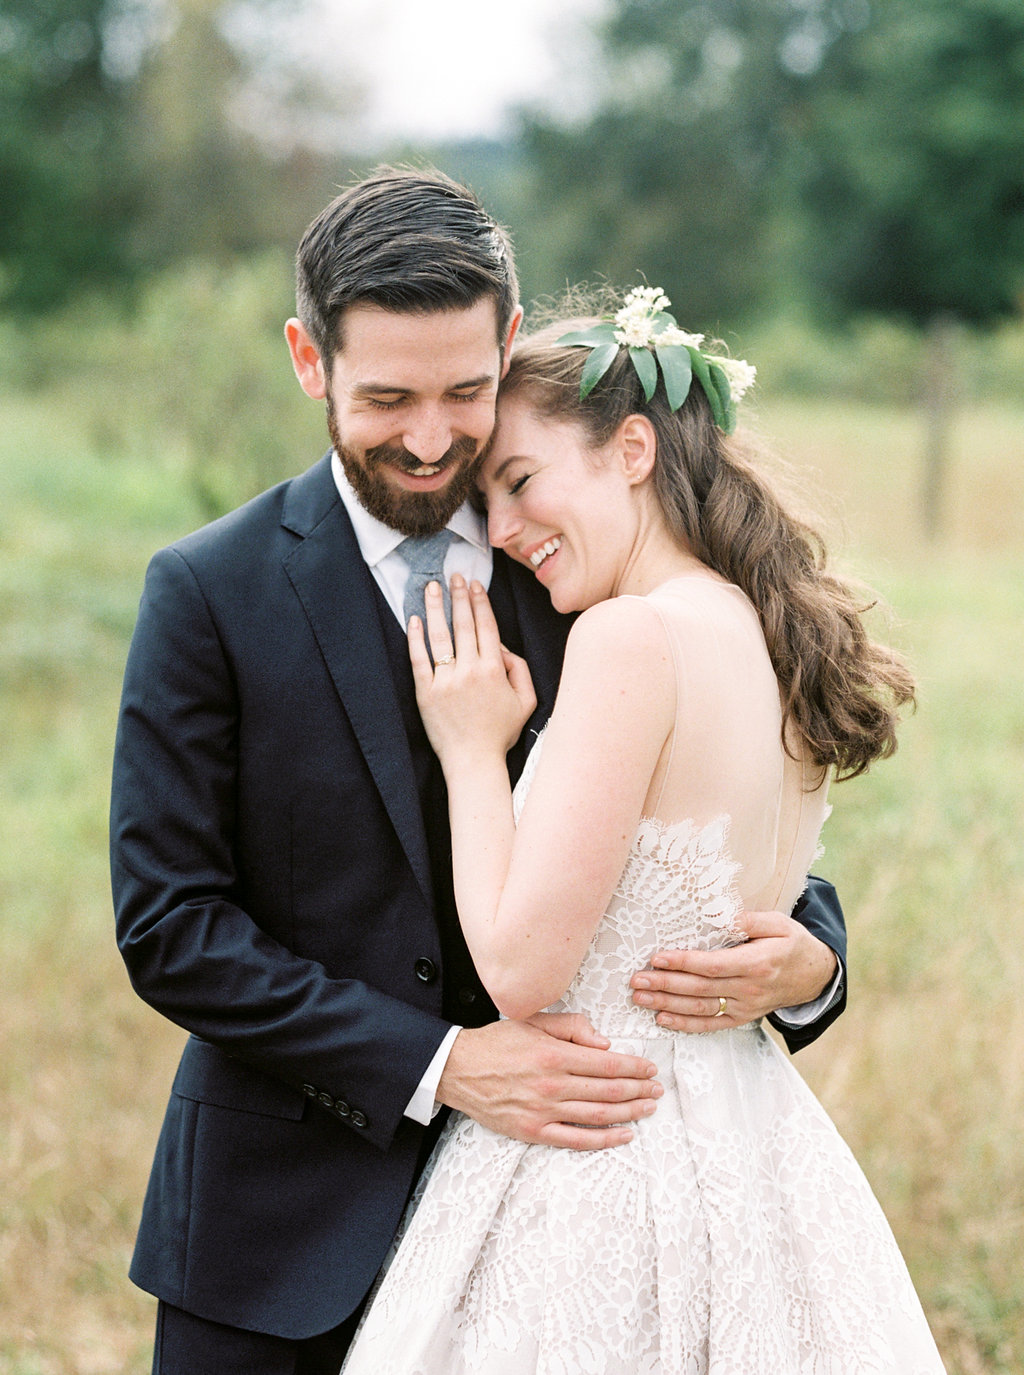 Jenna-Powers-chelsea&brandonwedding-884.jpg